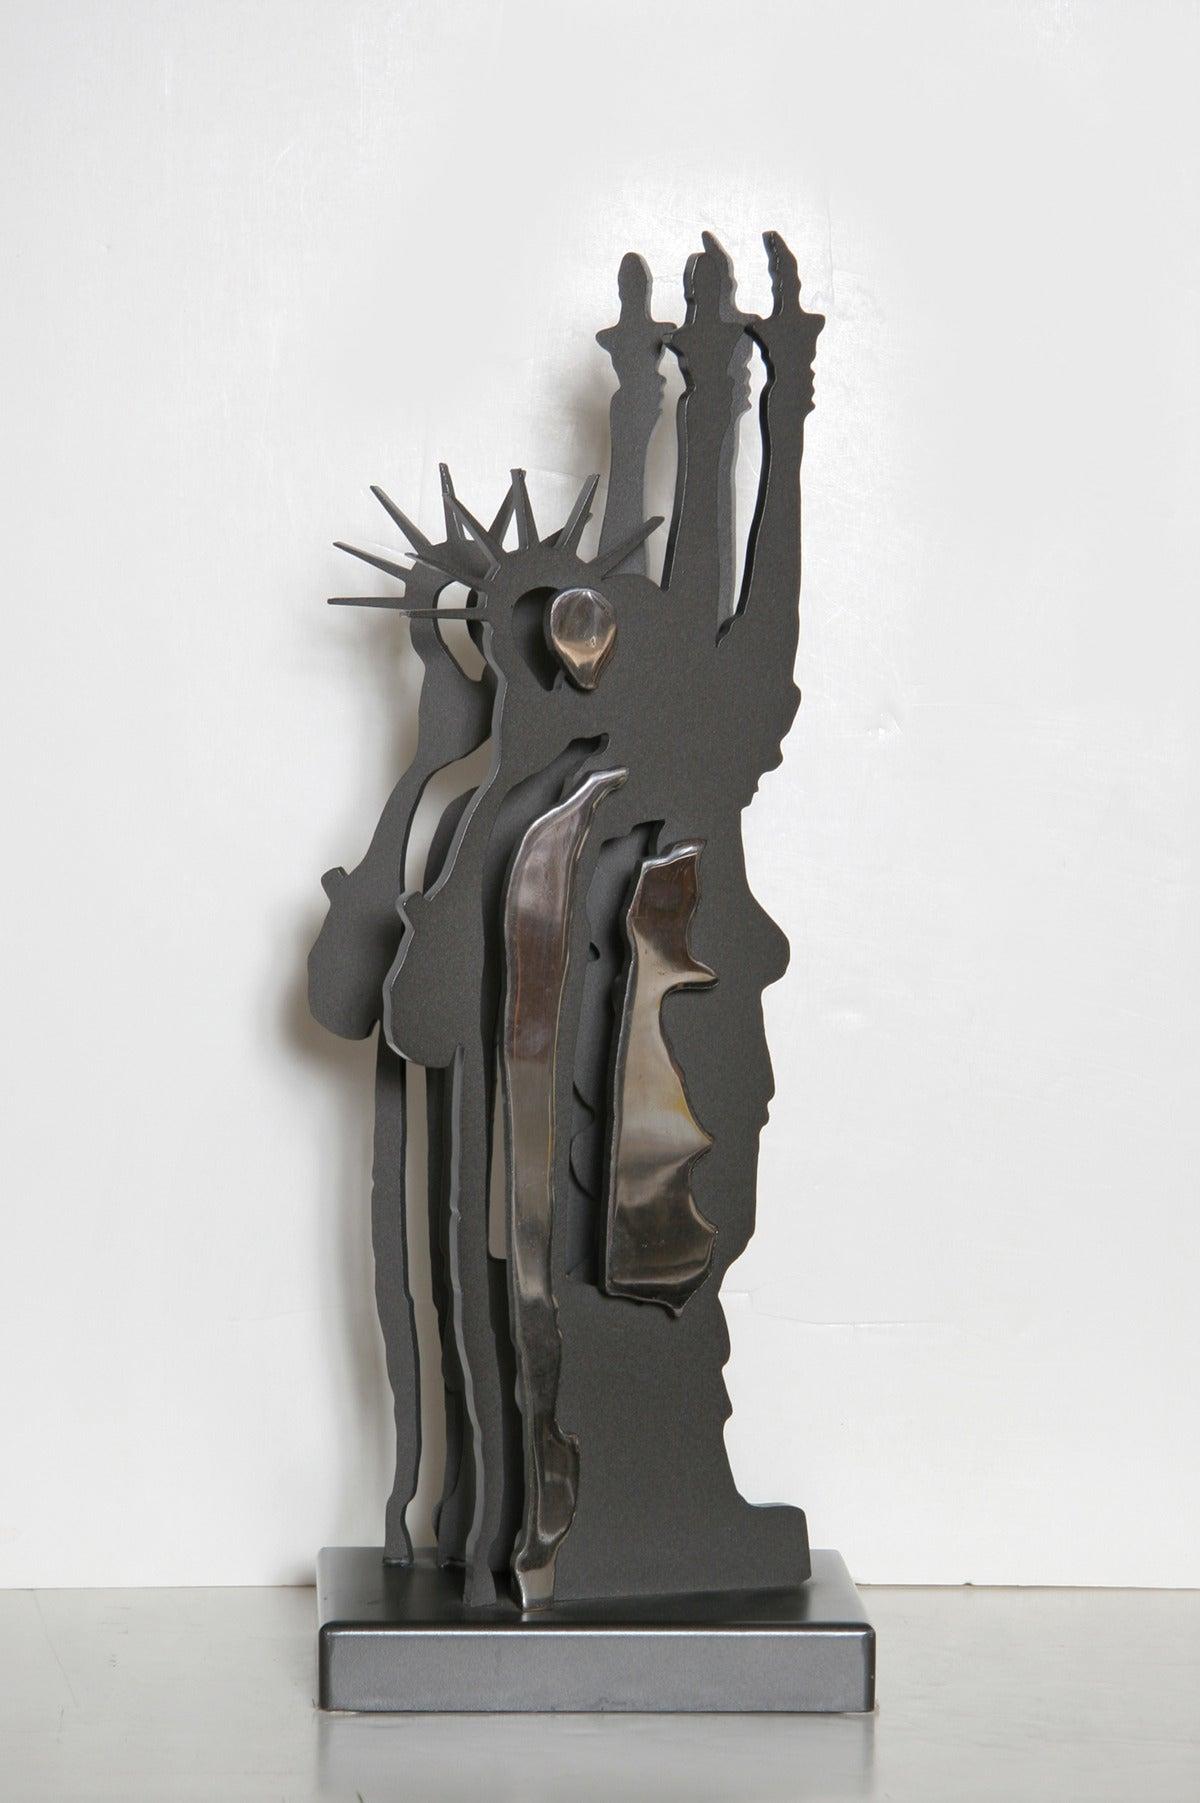 Statue of Liberty - Le Fantome de la Liberte - Black Figurative Sculpture by Fernandez Arman